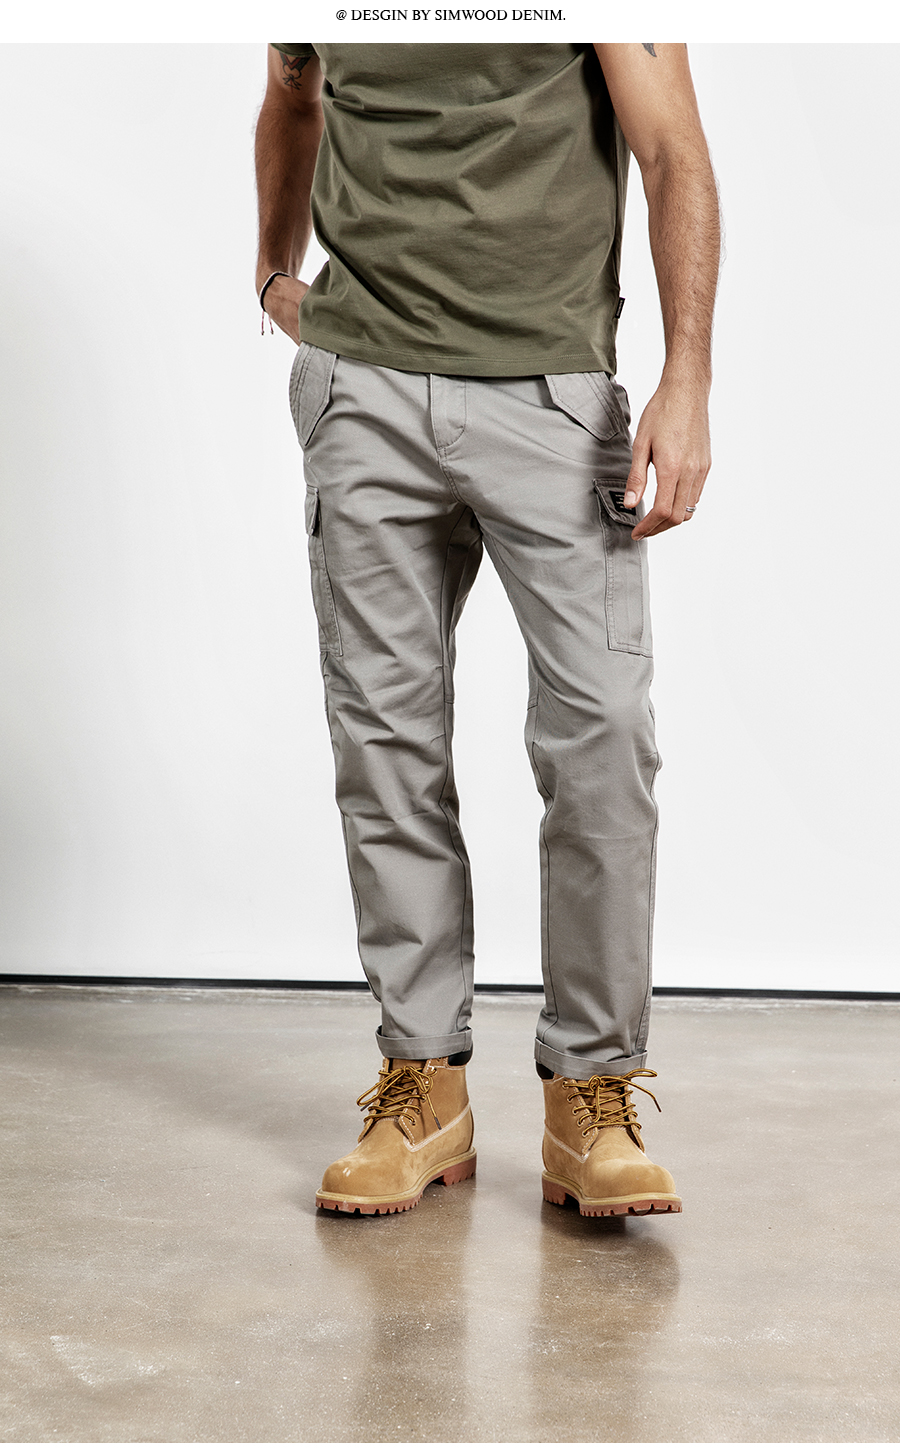 H8a2f631be68d4704beb39b9da3005889X SIMWOOD New 2019 Casual Pants Men Fashion track Cargo Pants Ankle-Length military autumn Trousers Men pantalon hombre 180614